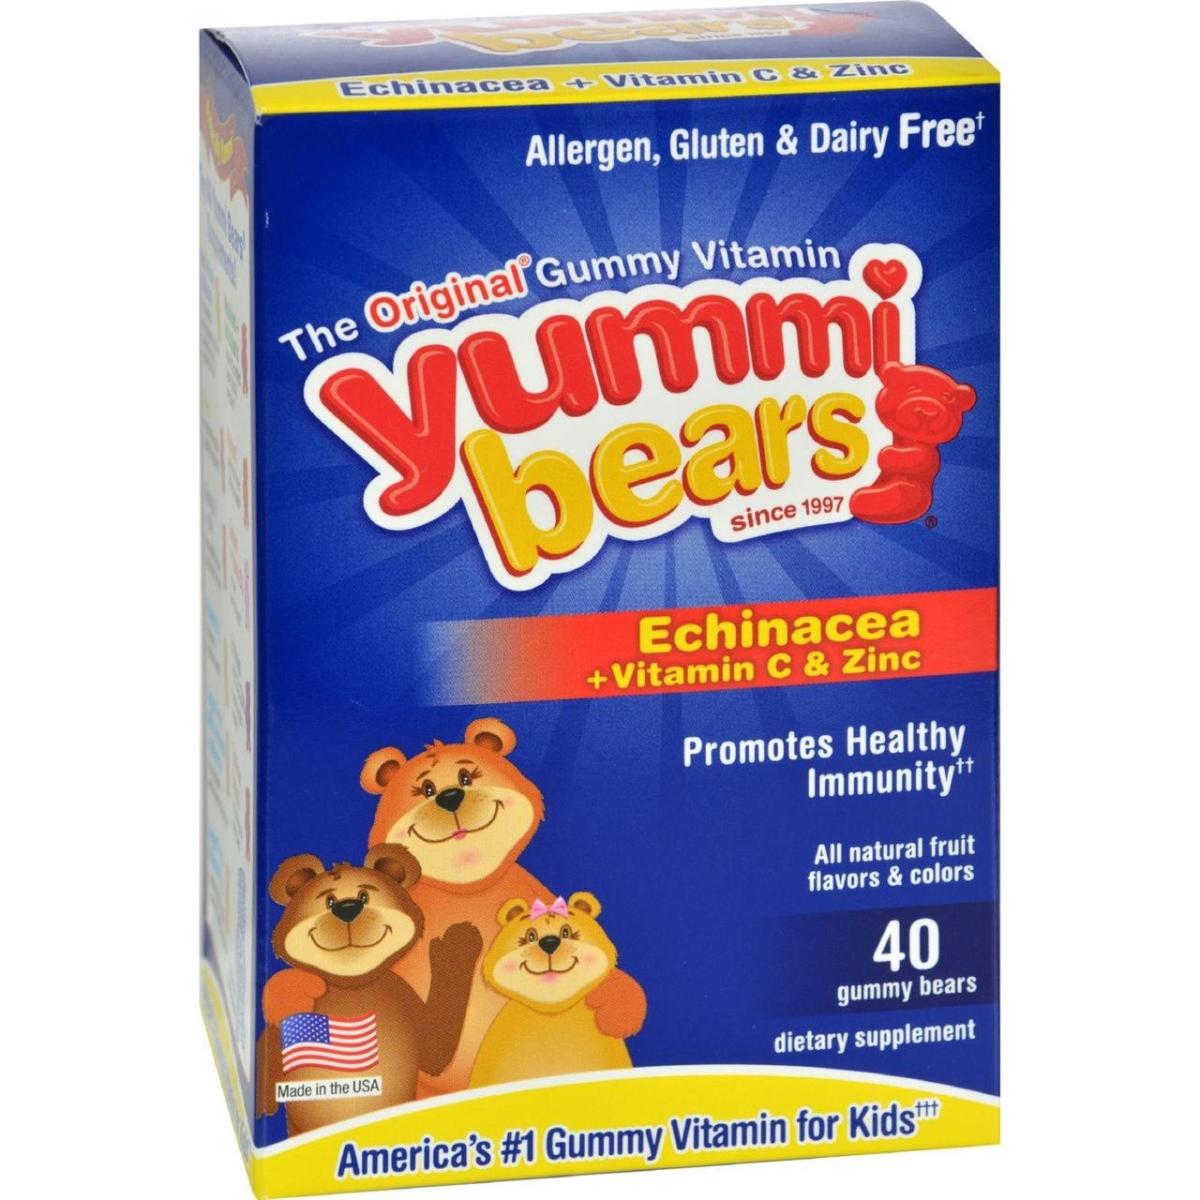 Hero Nutritional Products HG0943266 Yummi Bears Echinacea Plus Vitamin C & Zinc - 40 Chewables